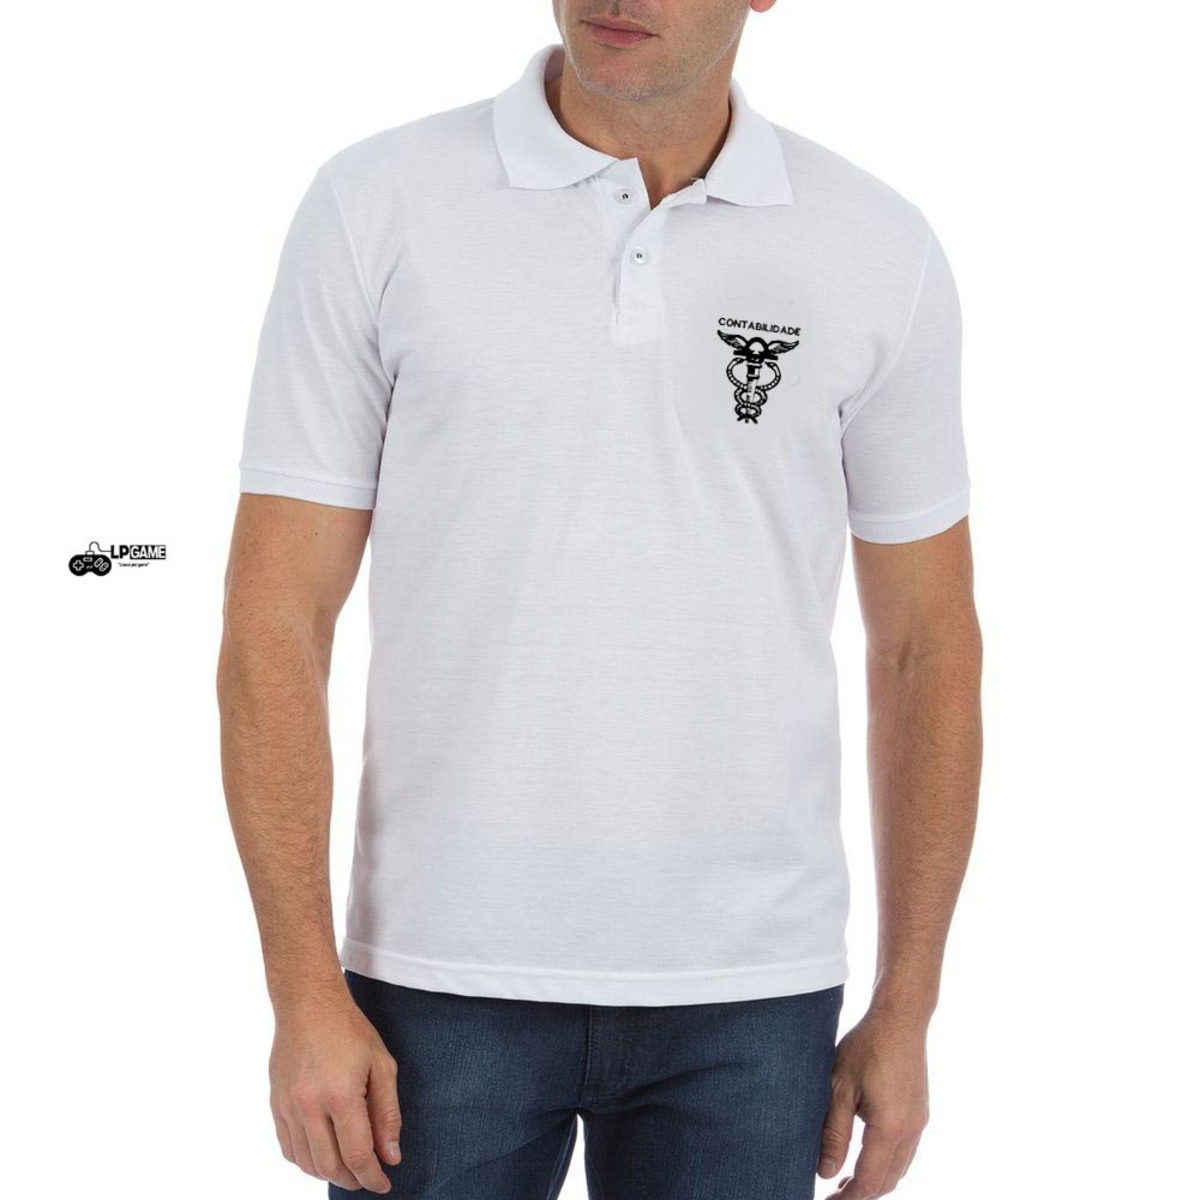 b23b8b78e7 Camisa Polo universitaria Contabilidade no Elo7